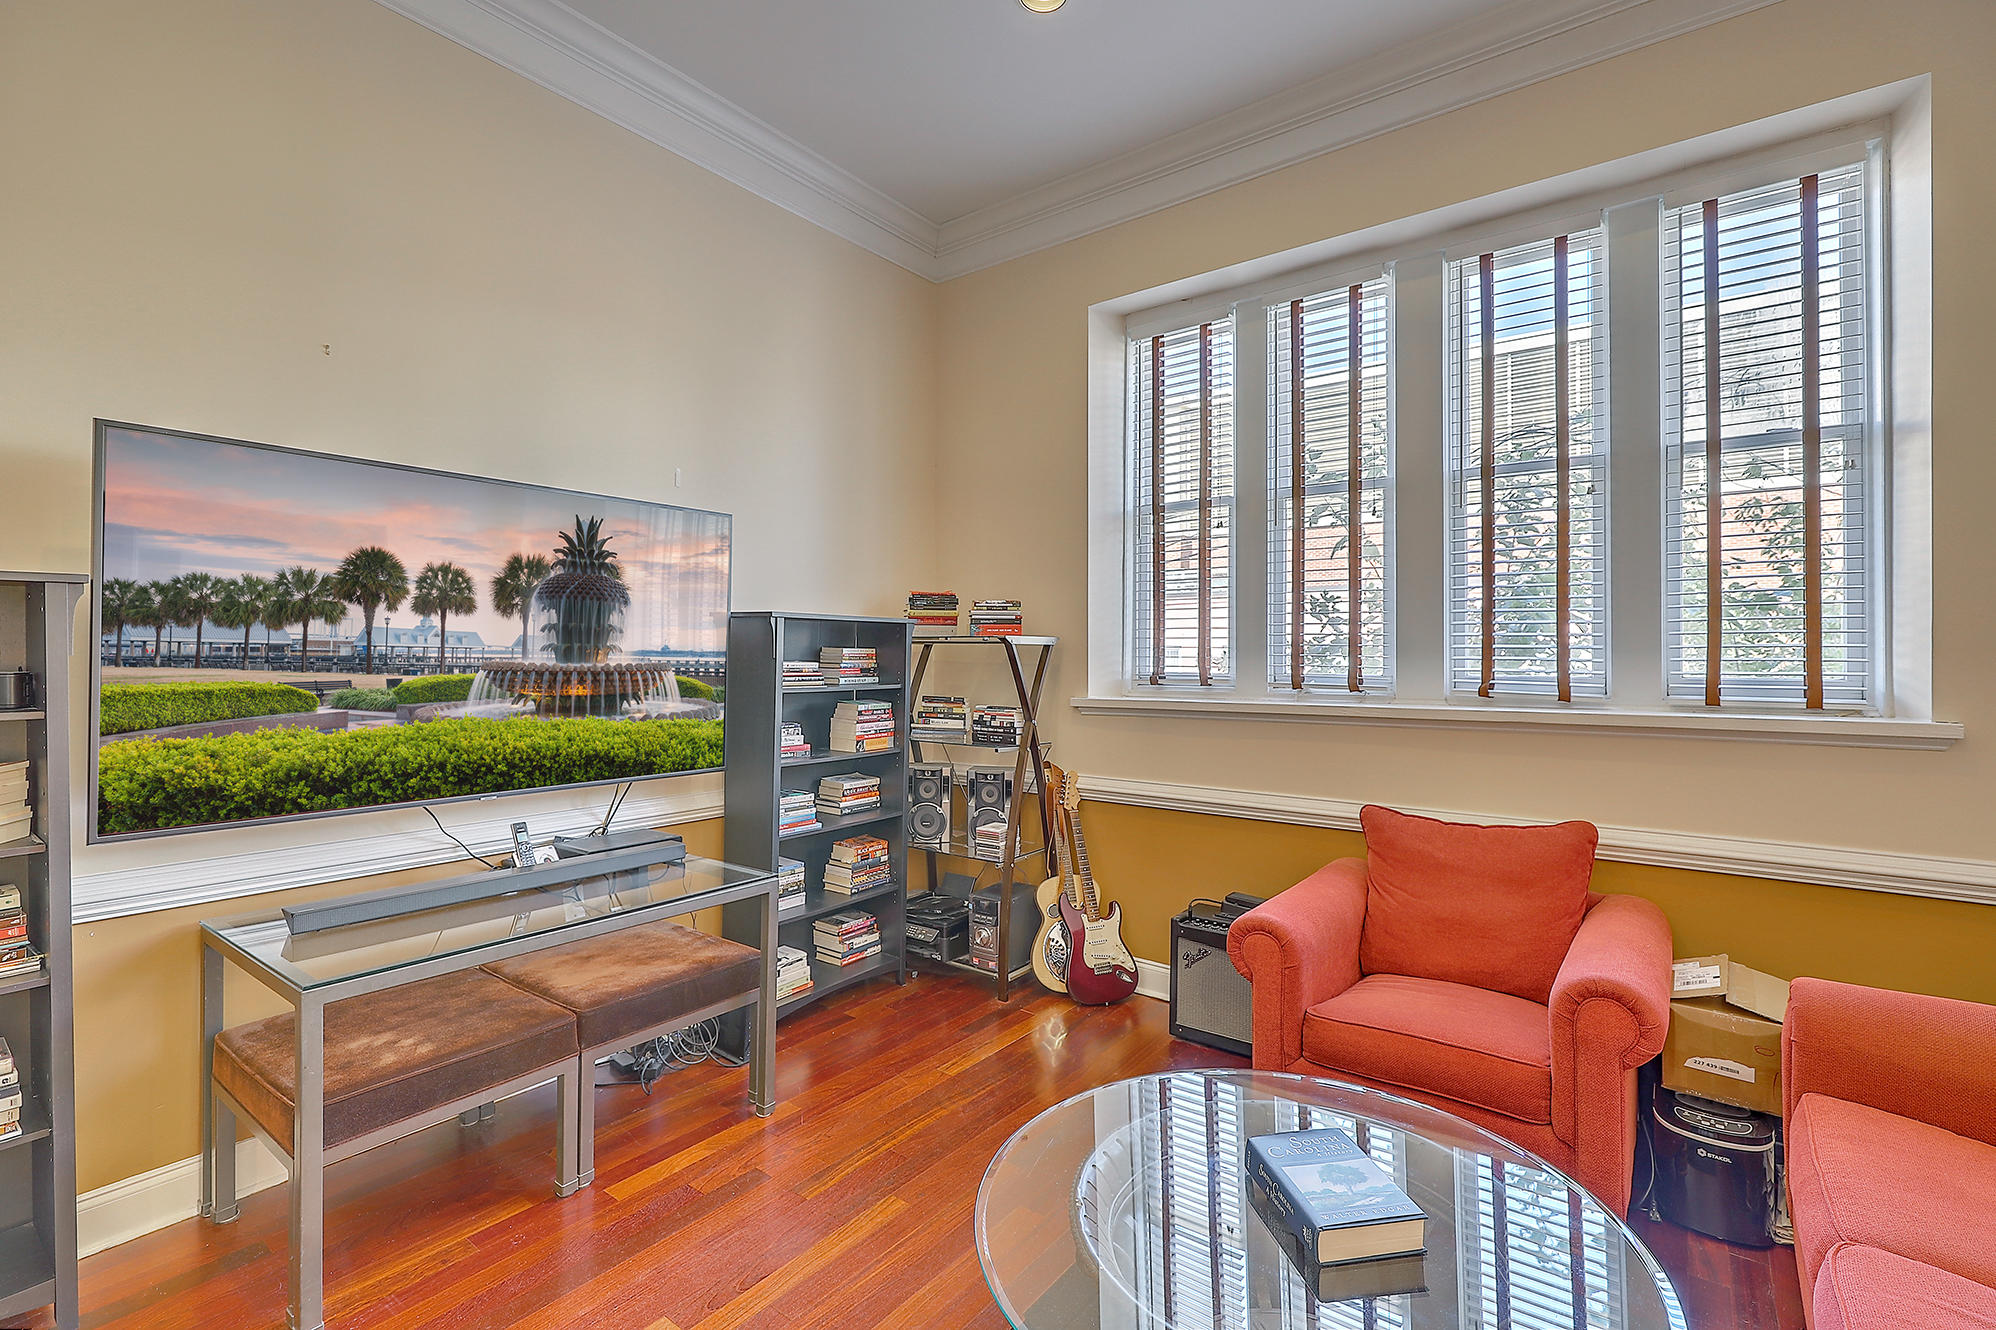 King Street Lofts Homes For Sale - 350 King, Charleston, SC - 9